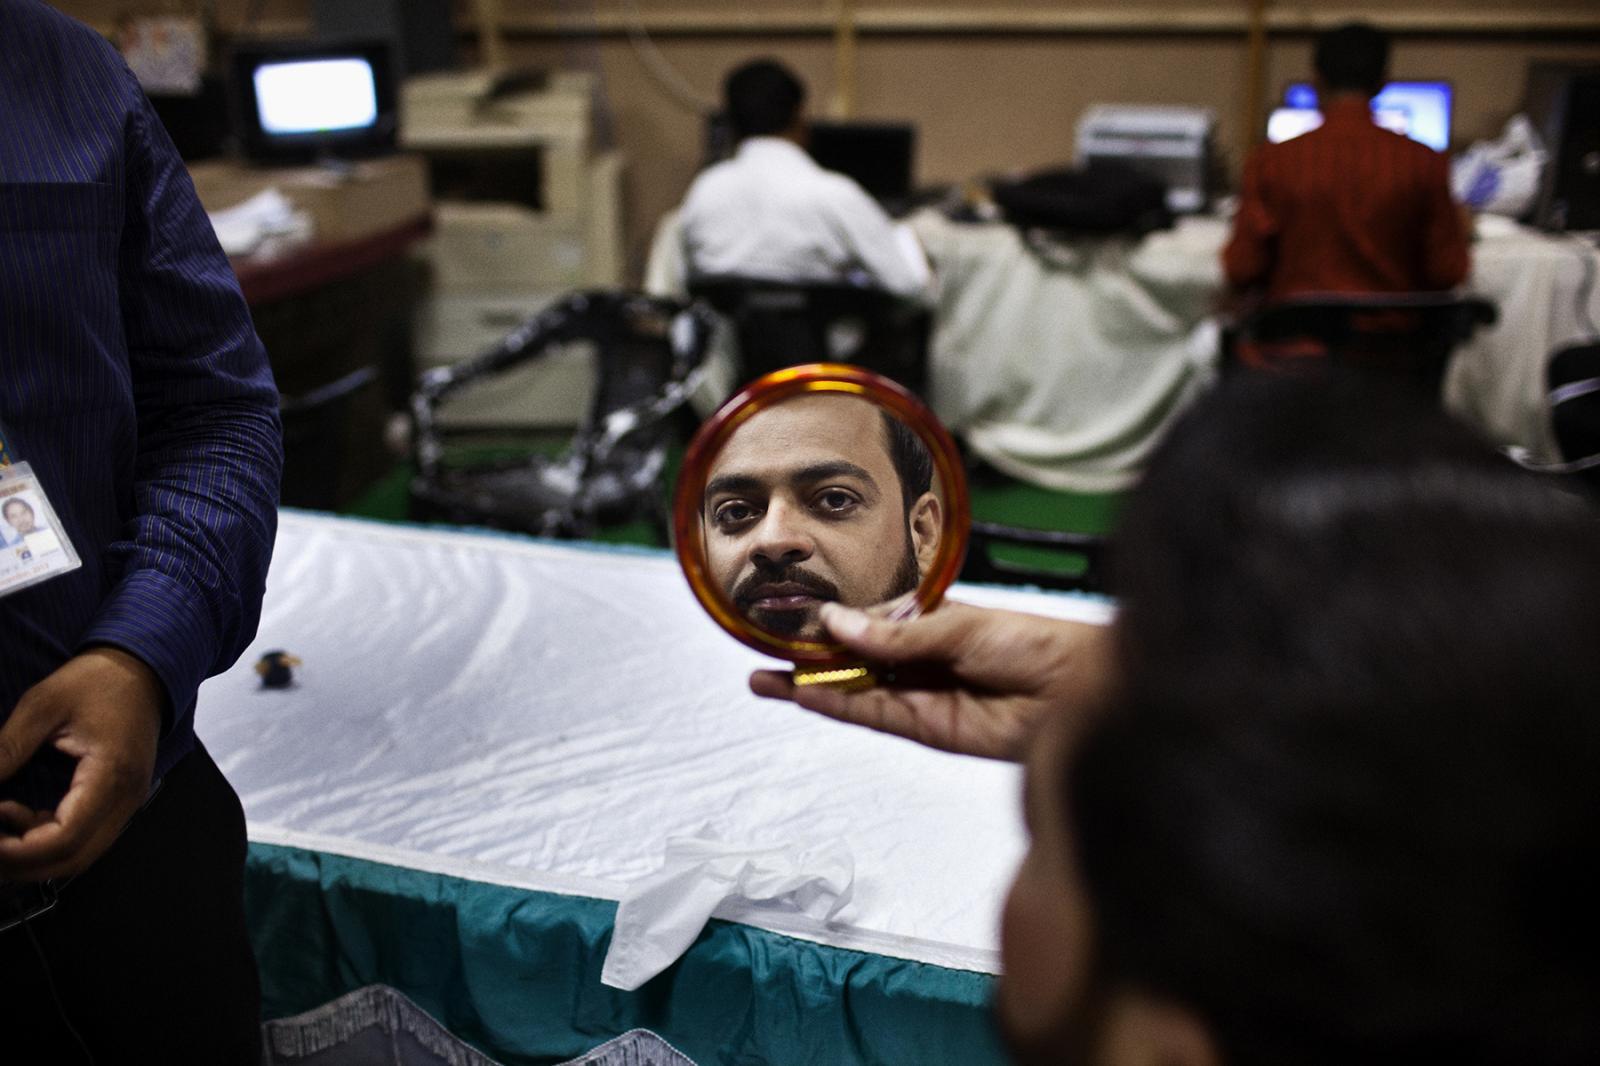 Photography image - Loading Preacher-Pakistan-NYT_03.jpg